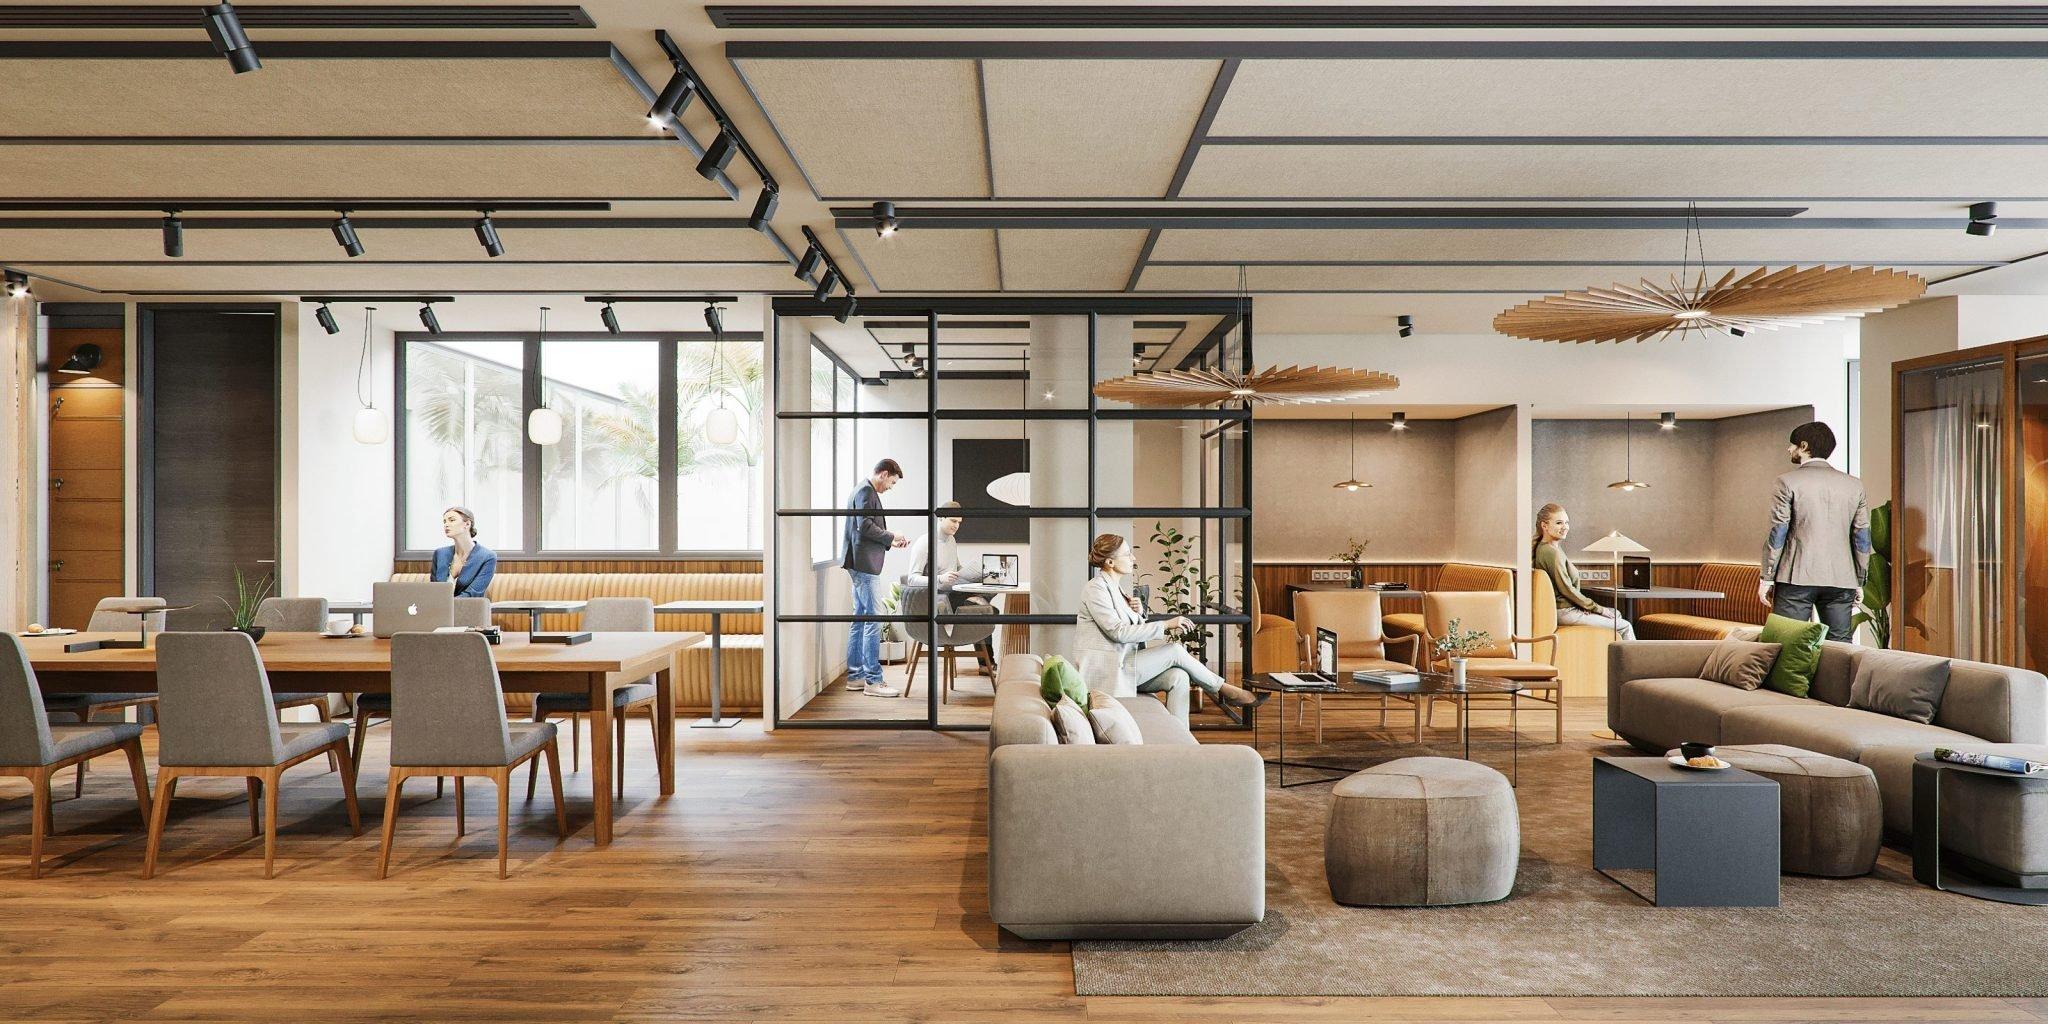 renders interiores coworking